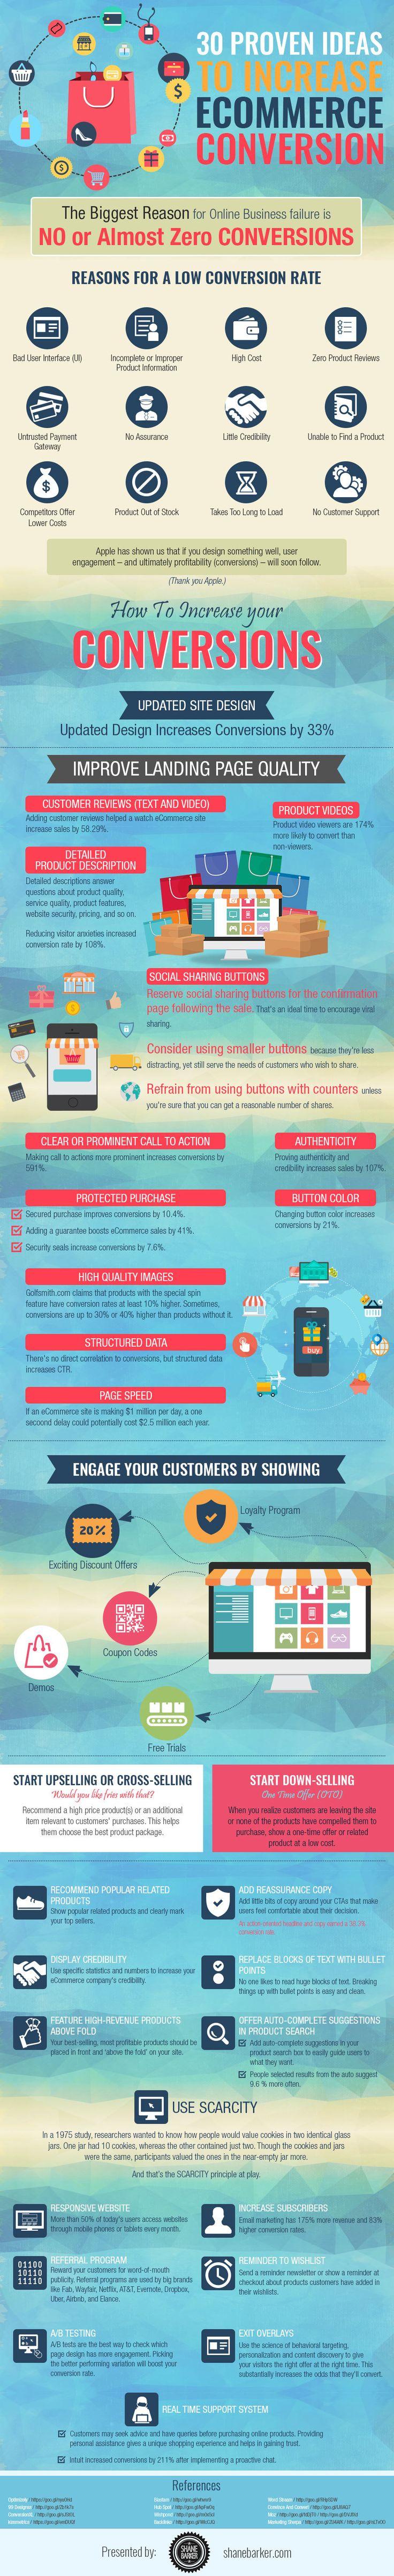 30 Proven Ideas To Increase E-commerce Conversion Infographic